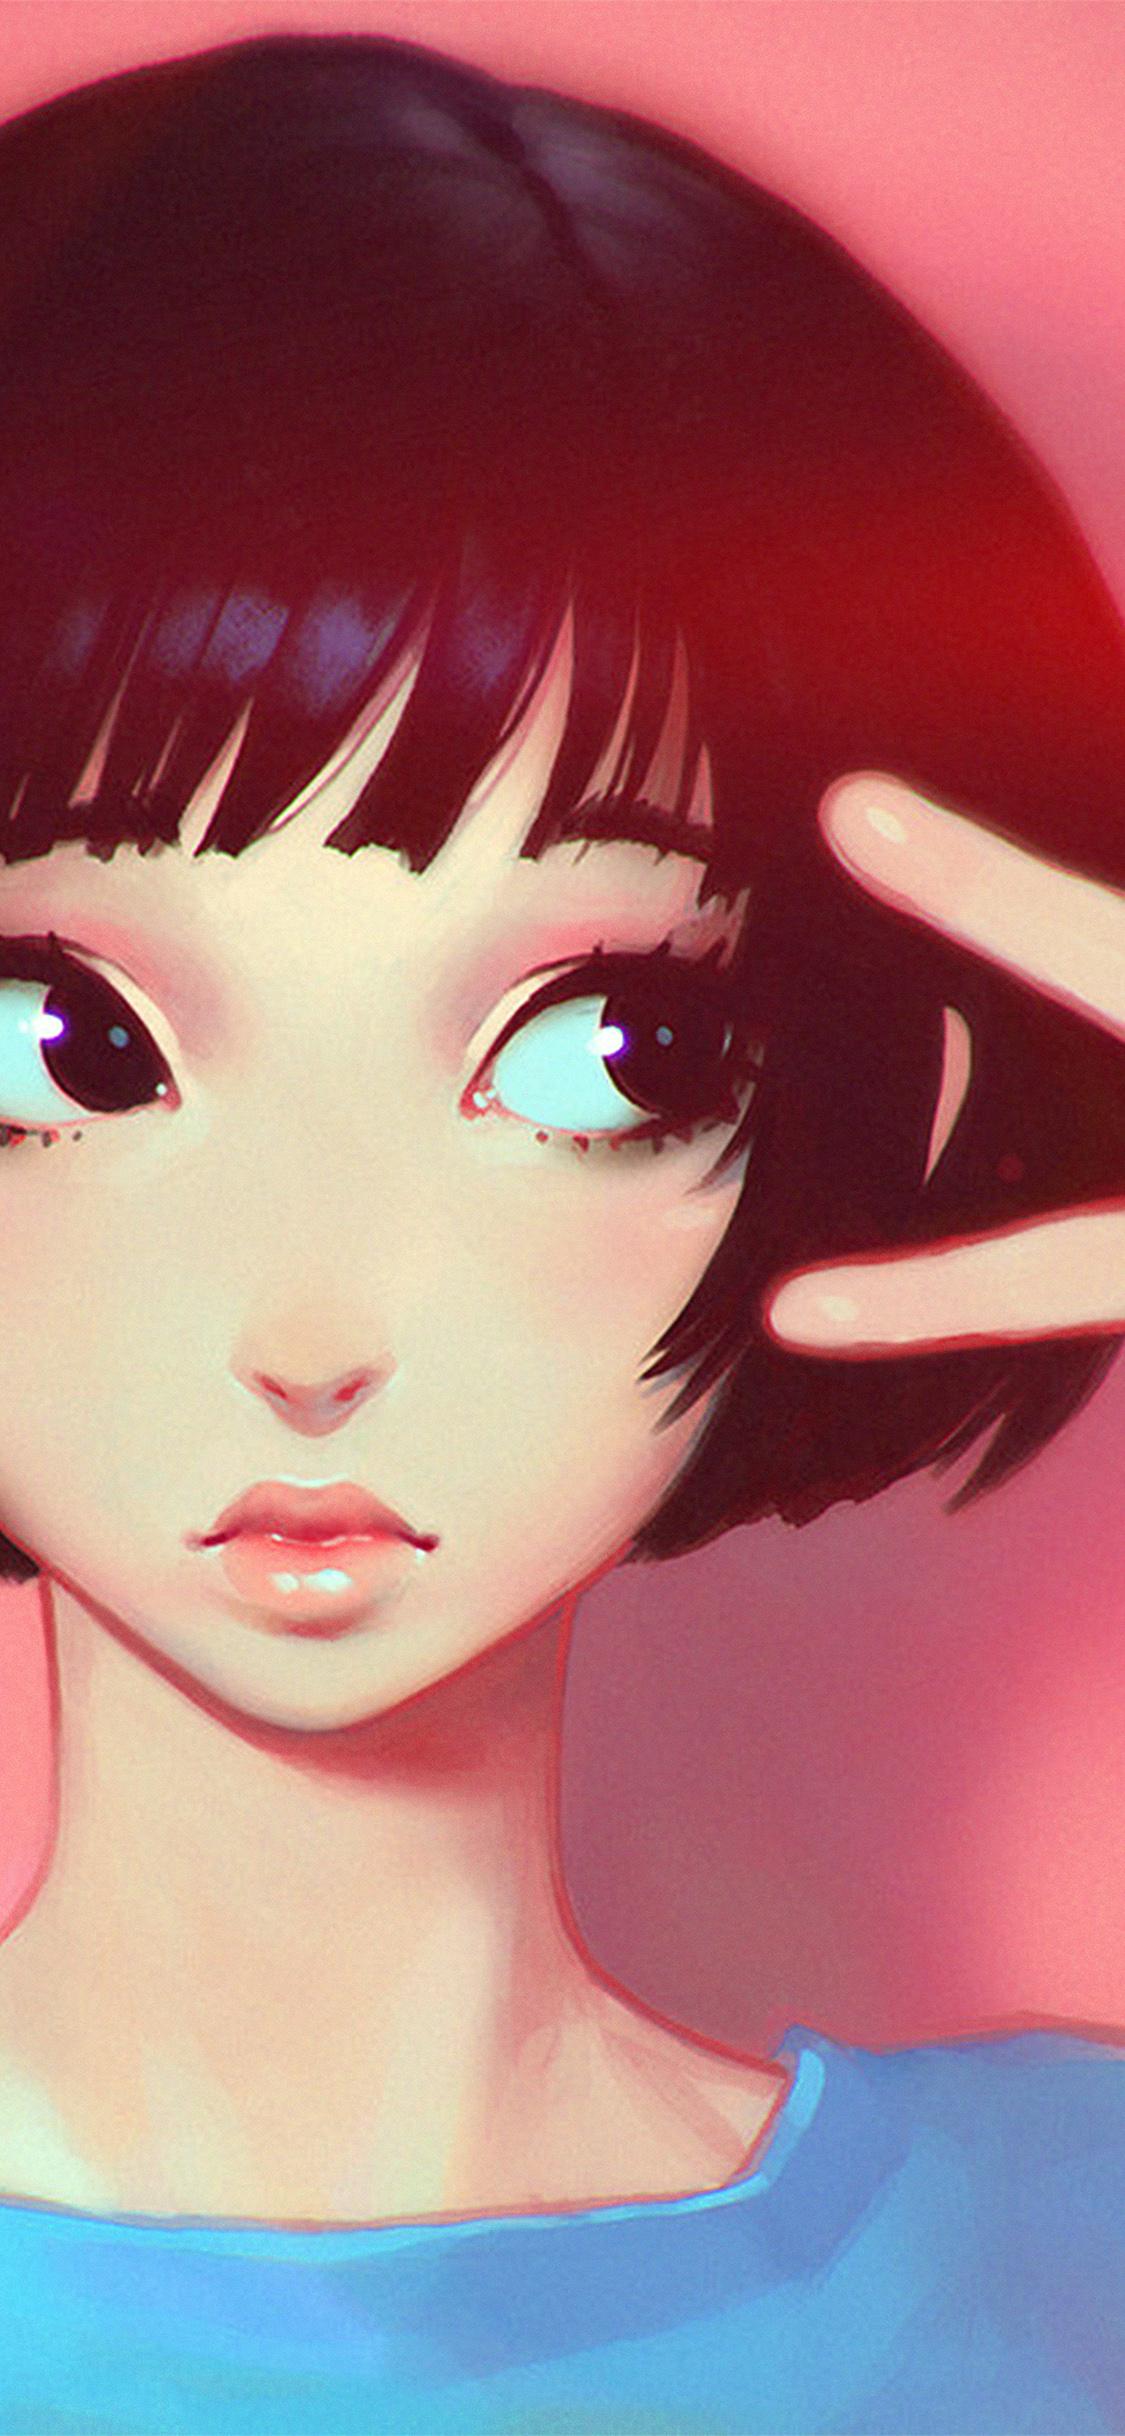 iPhonexpapers.com-Apple-iPhone-wallpaper-ay04-ilya-kuvshinov-pink-girl-illustration-art-pink-flare